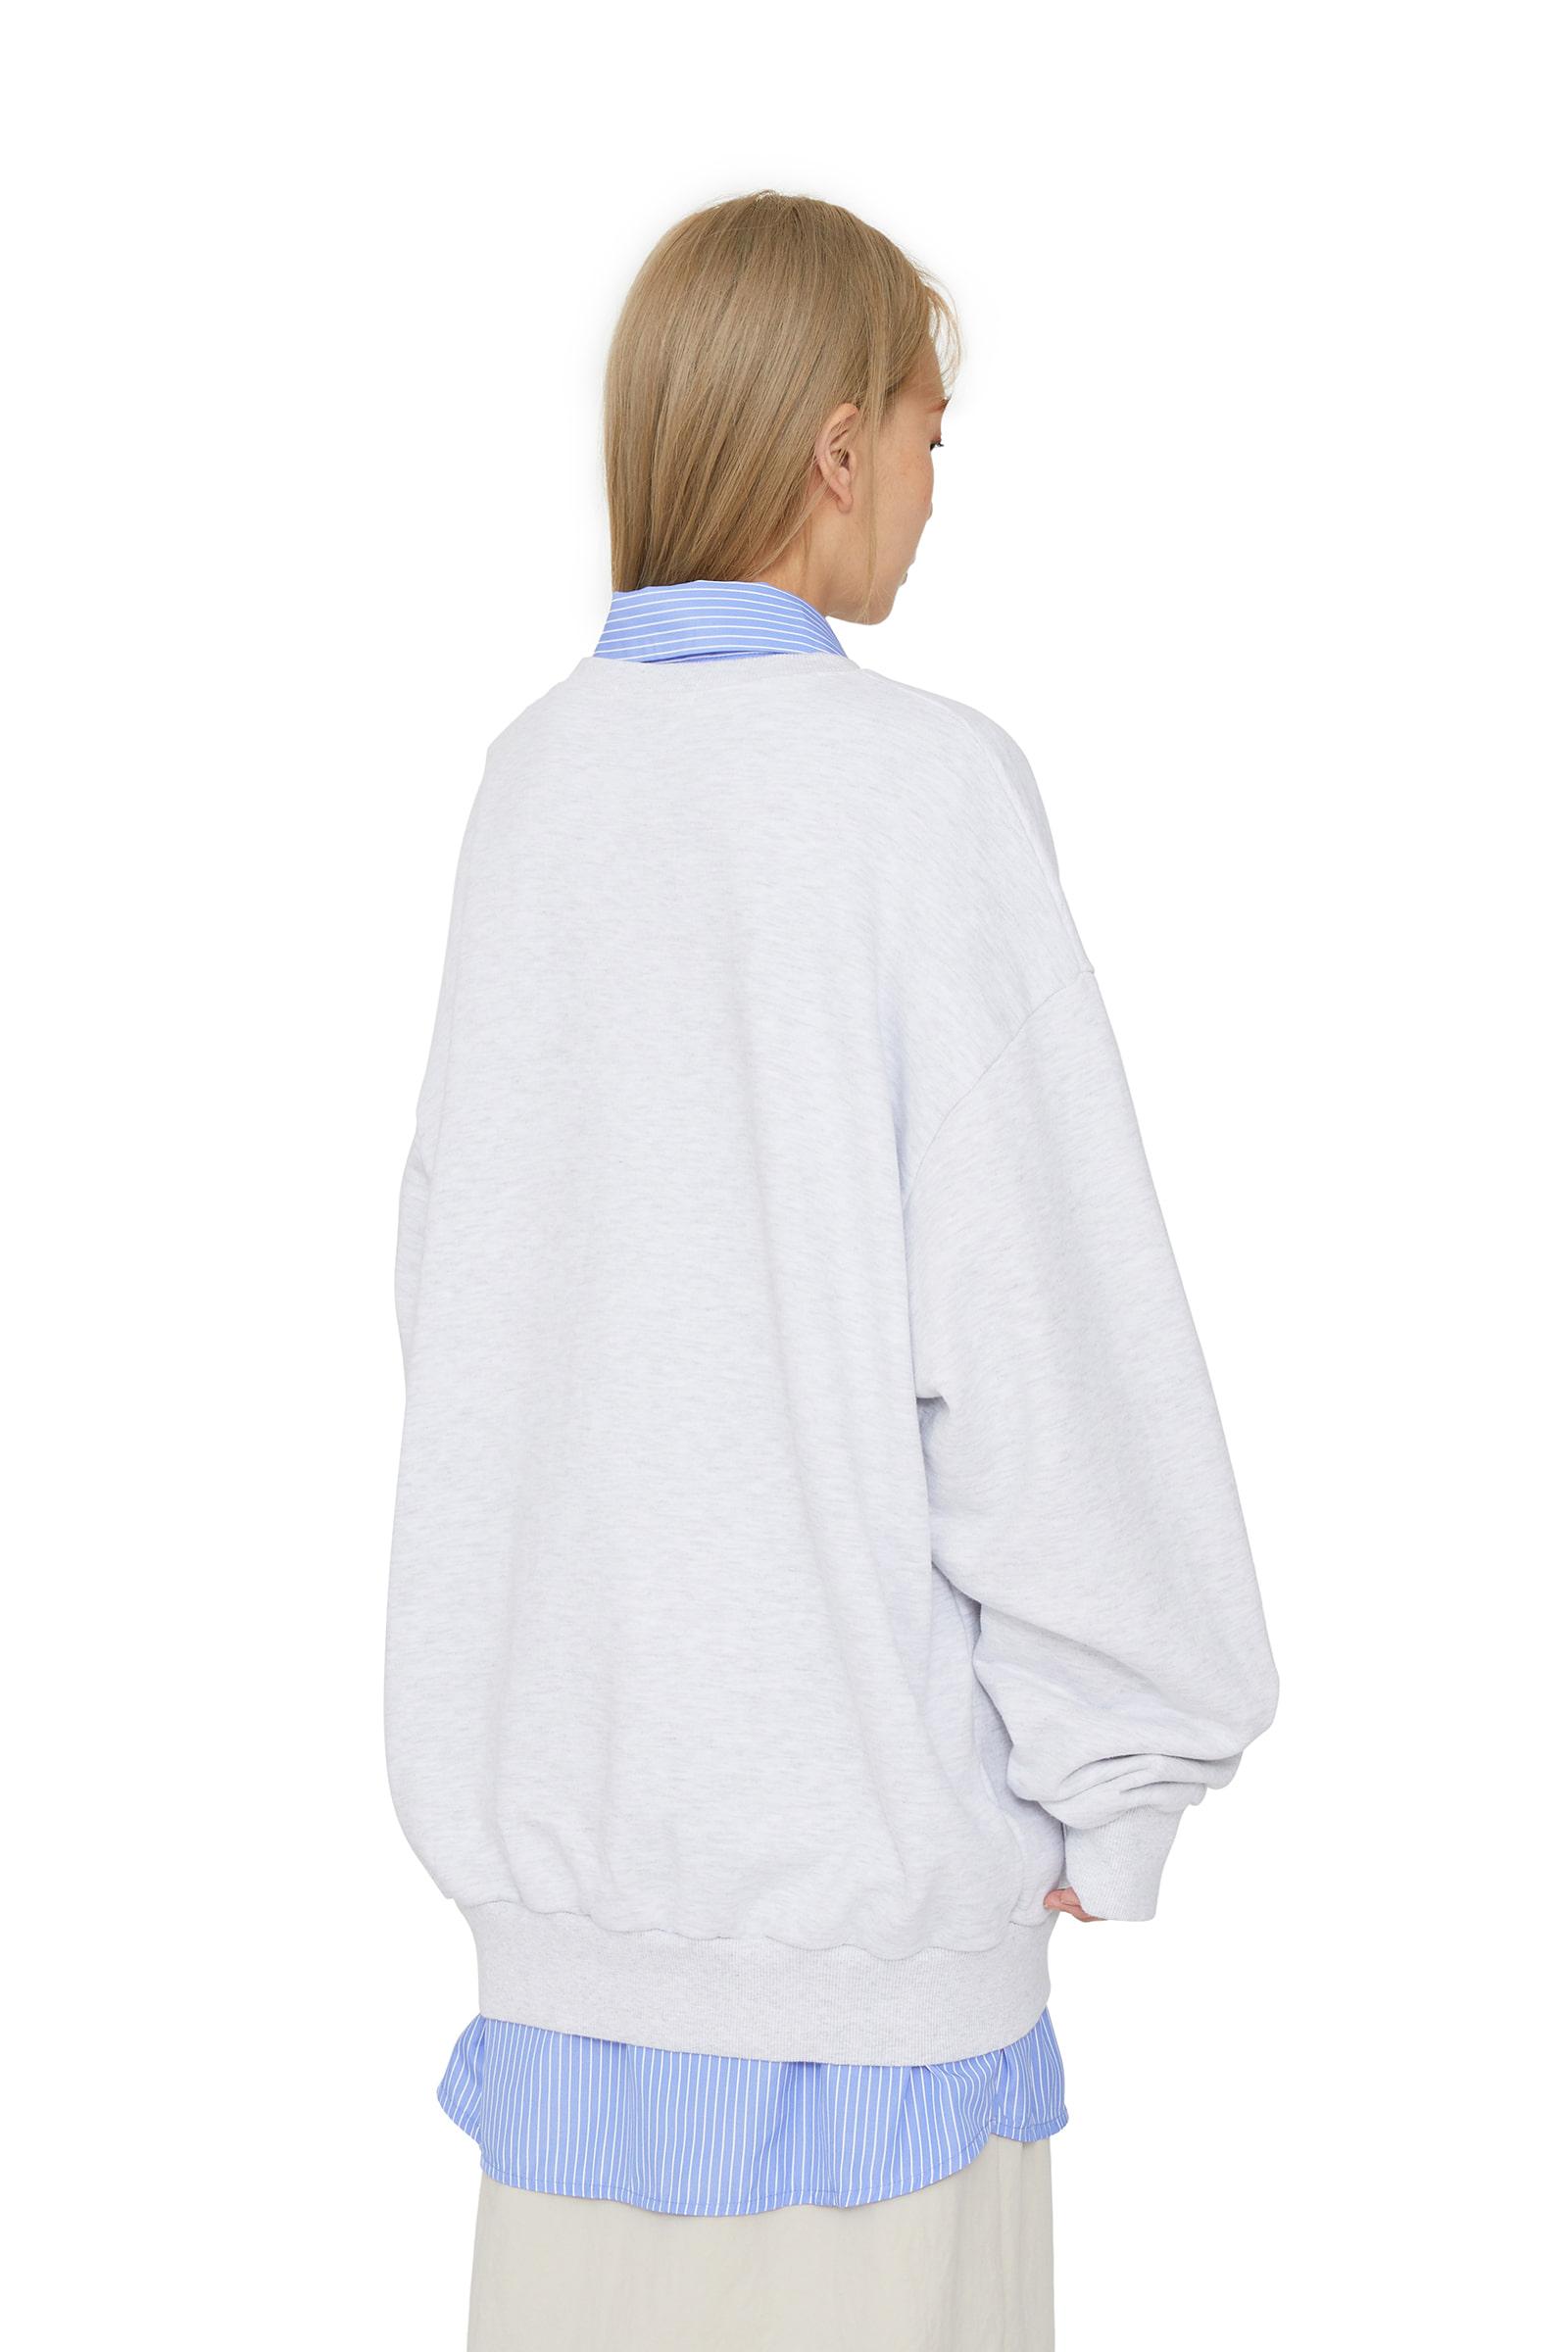 Unisex Sonic Youth Crew Neck Sweatshirt